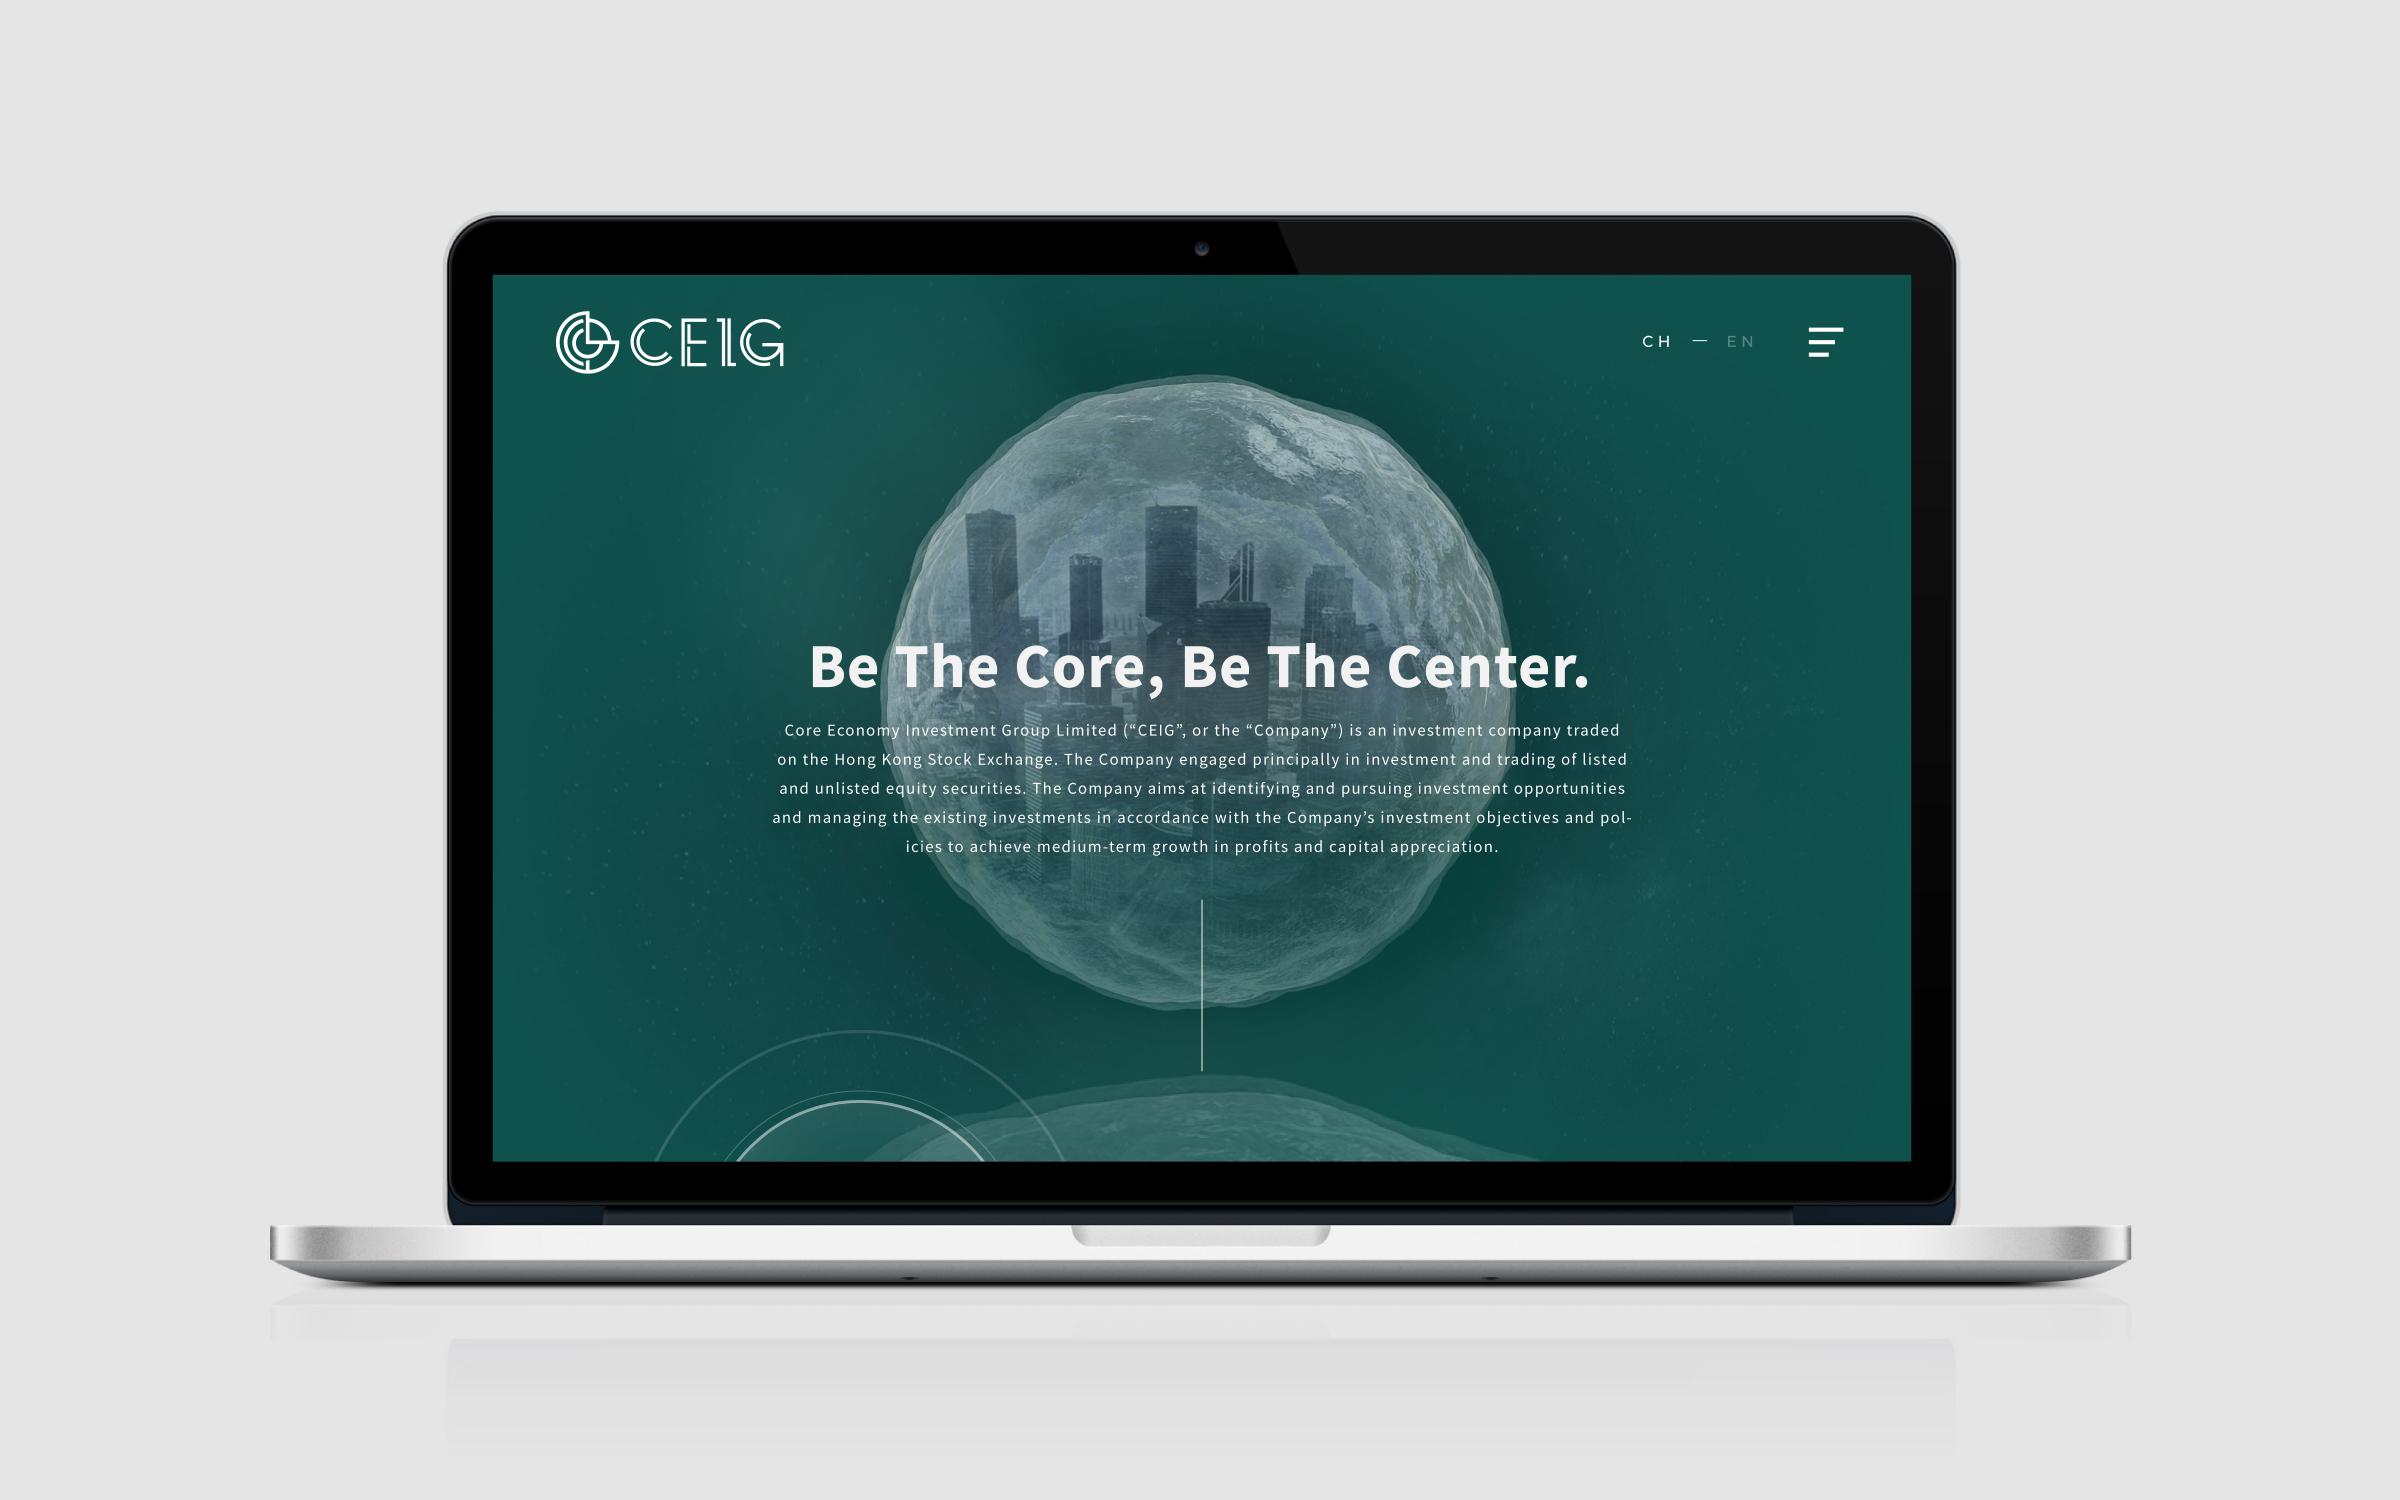 CEIG_Slide3.jpg